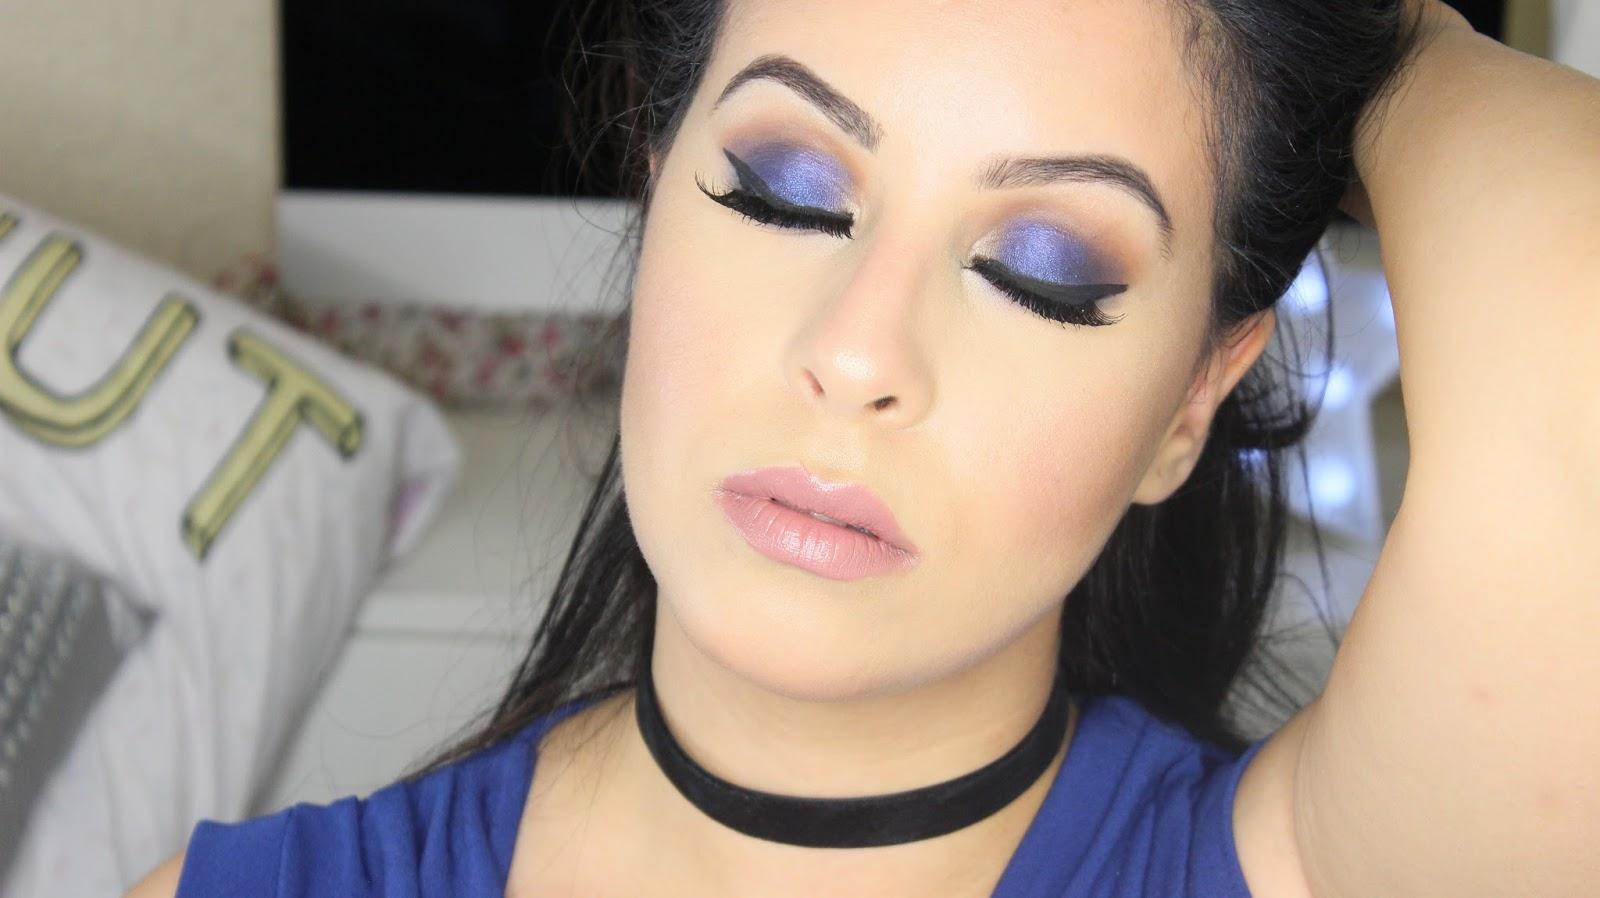 Navy Blue Eye Makeup Makeupgeek Cosmetics Youtube Video Beauty